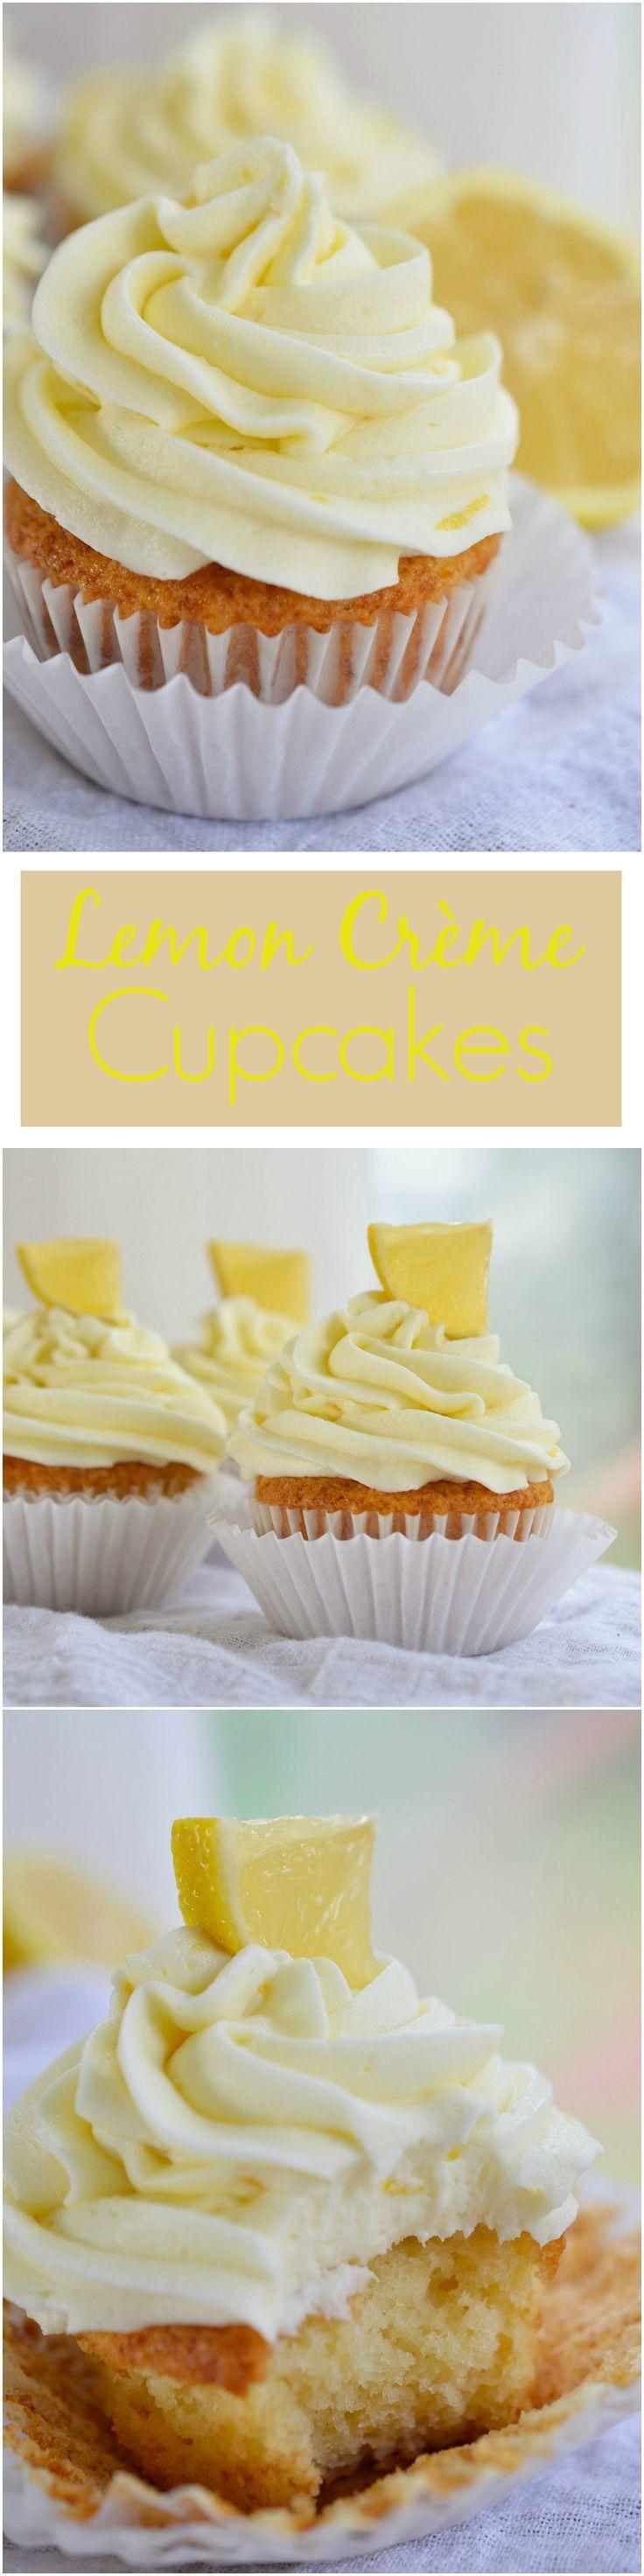 Easy Lemon Cupcakes topped with Creamy Lemon Buttercream Frosting made with Lemon Crème pie filling. A quick and easy lemon dessert! #lemon #cupcakes wonkywonderful.com